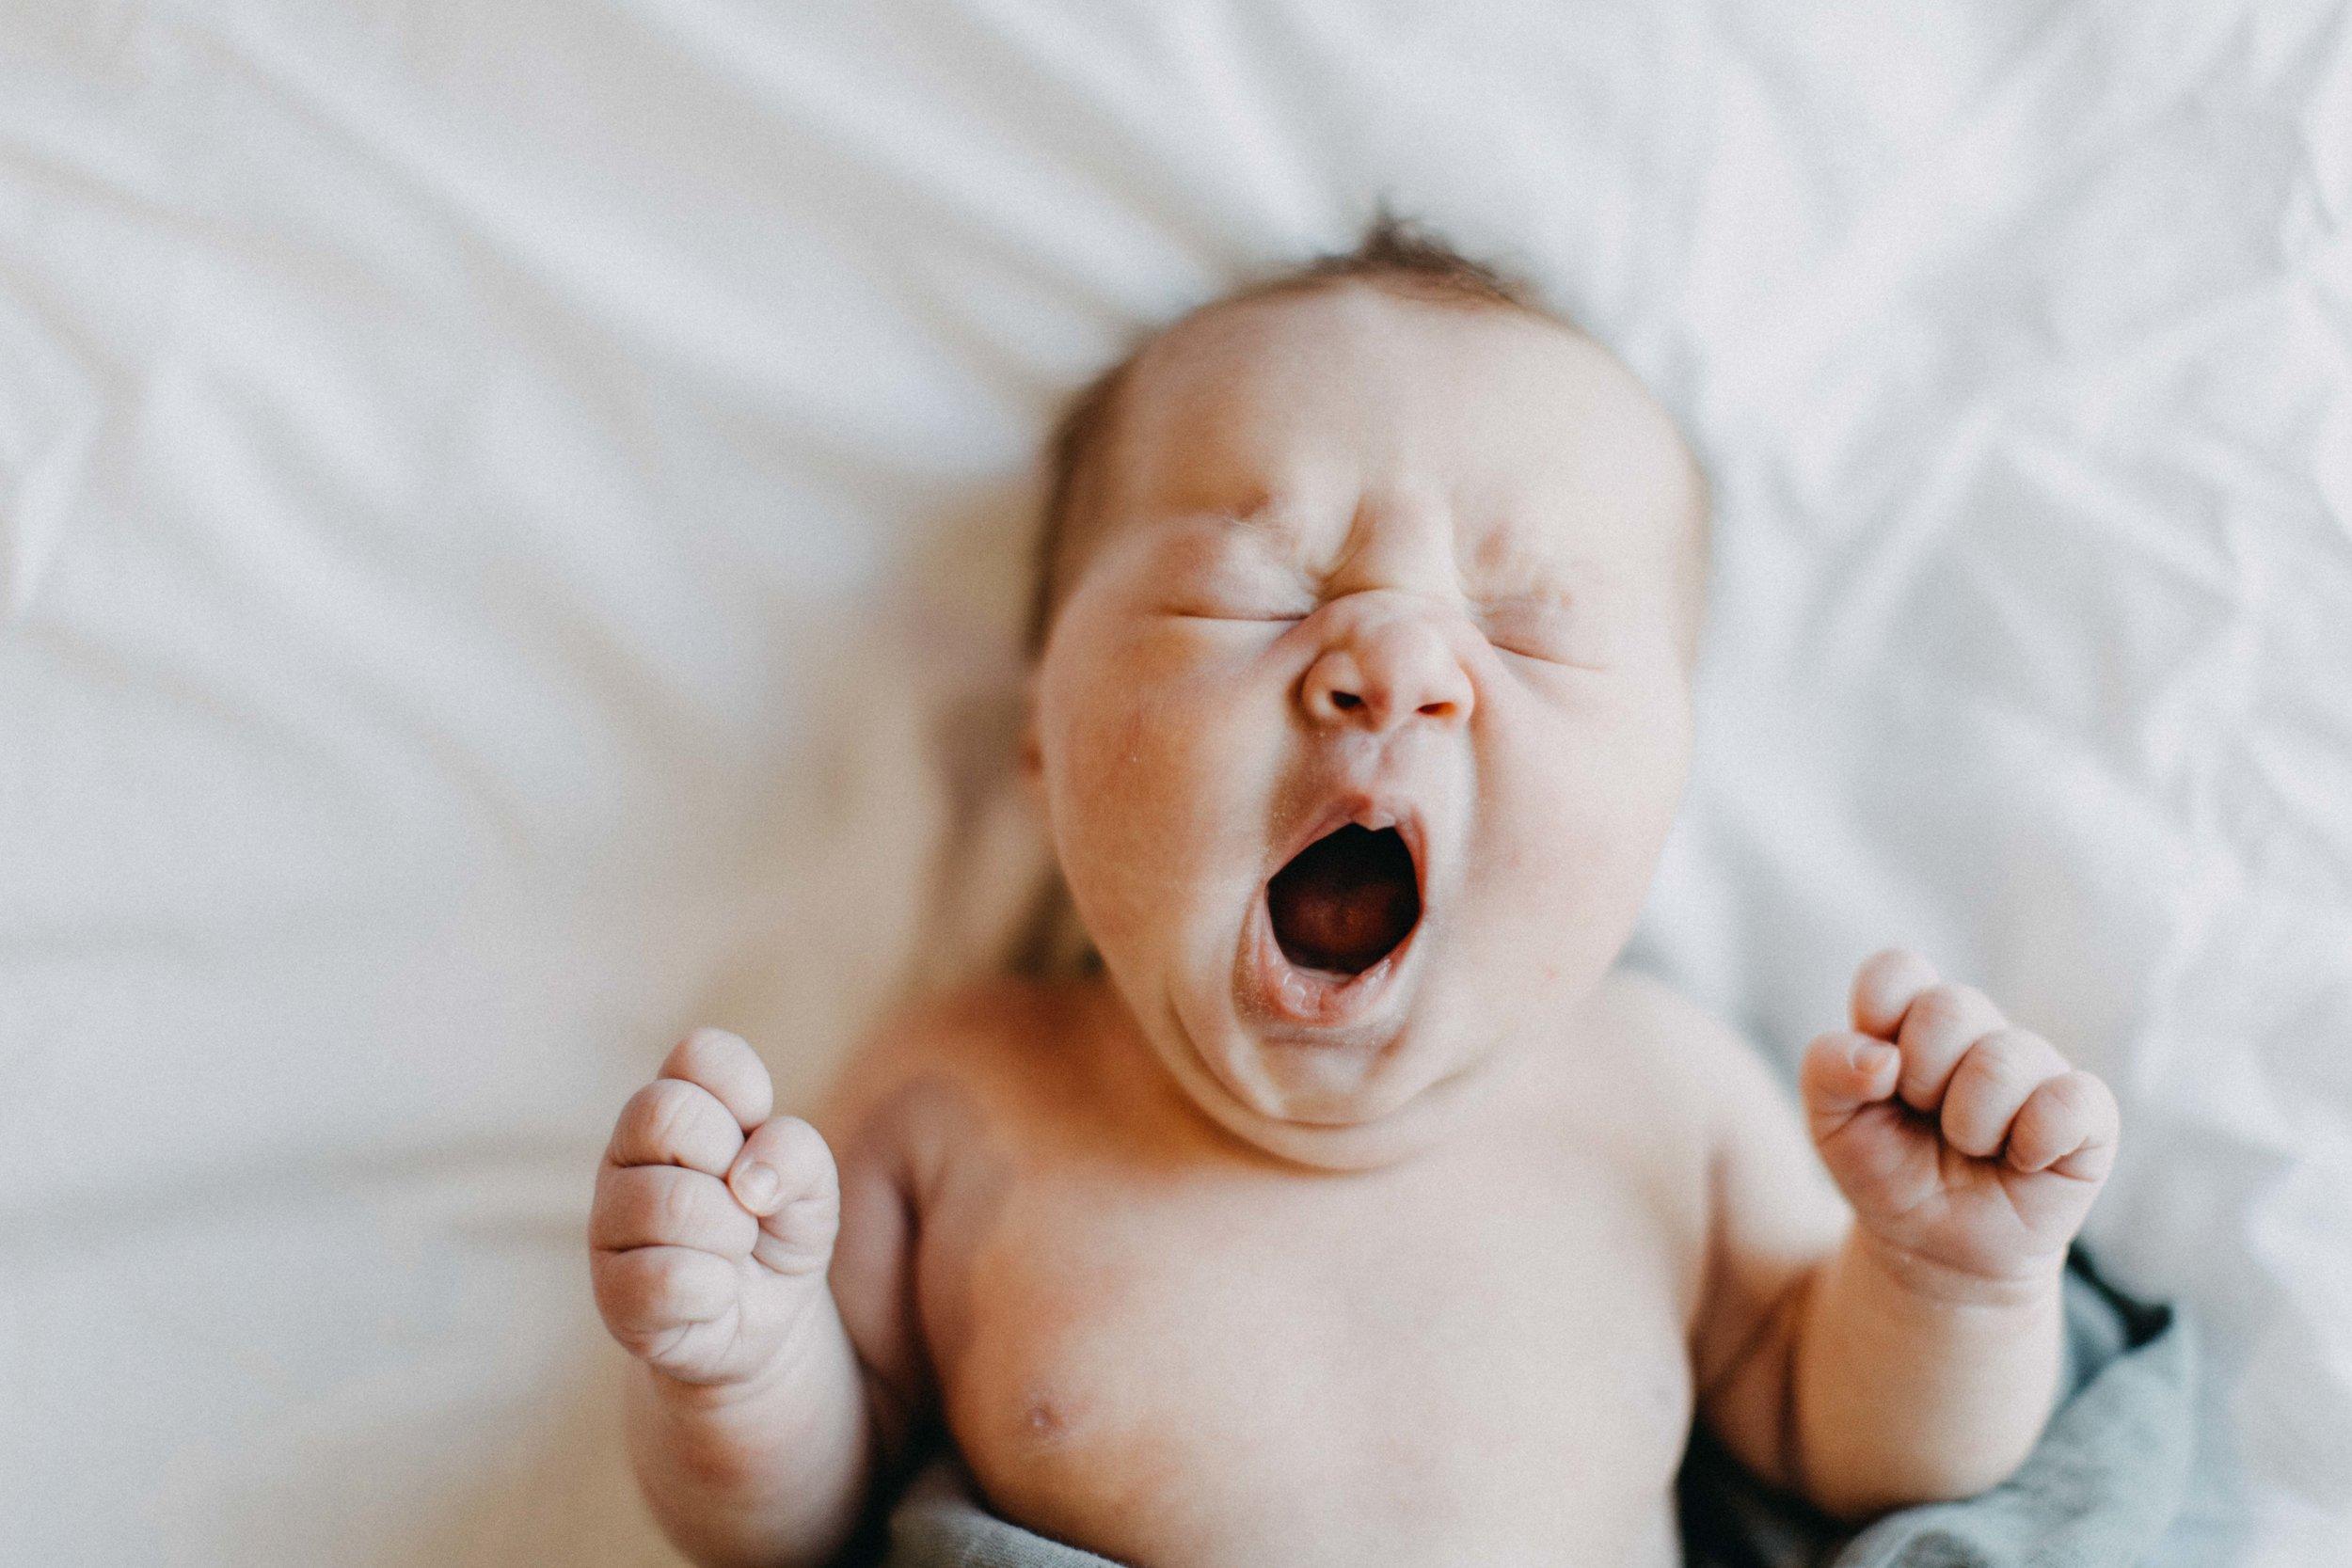 mittagong-newborn-photography-camden-macarthur-www.emilyobrienphotography.net-32.jpg